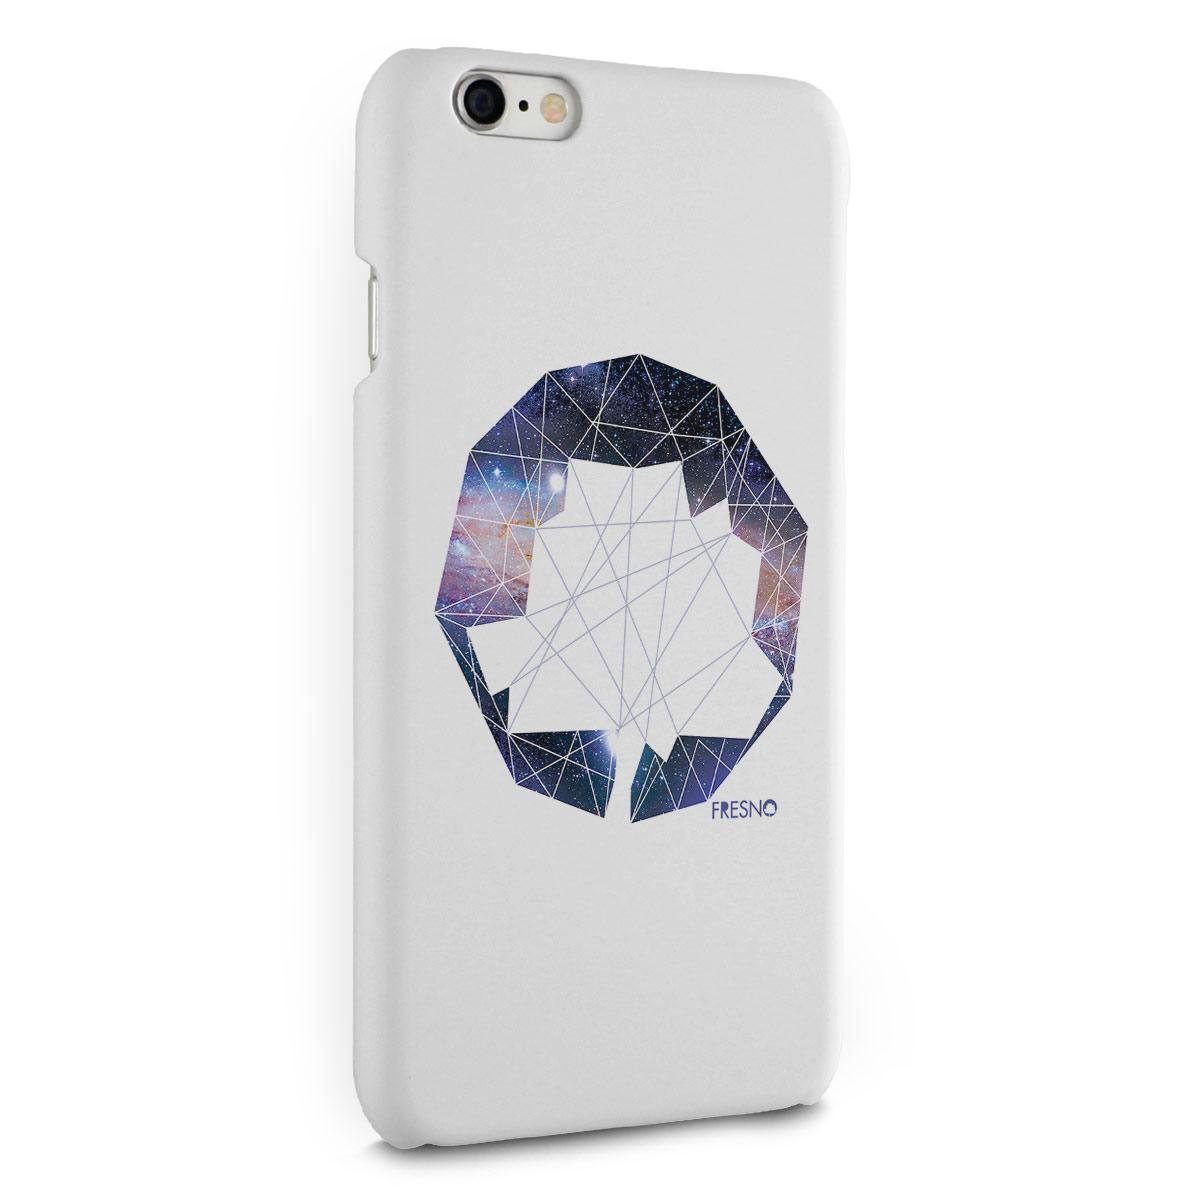 Capa para iPhone 6/6S Plus Fresno Logo Galáxias